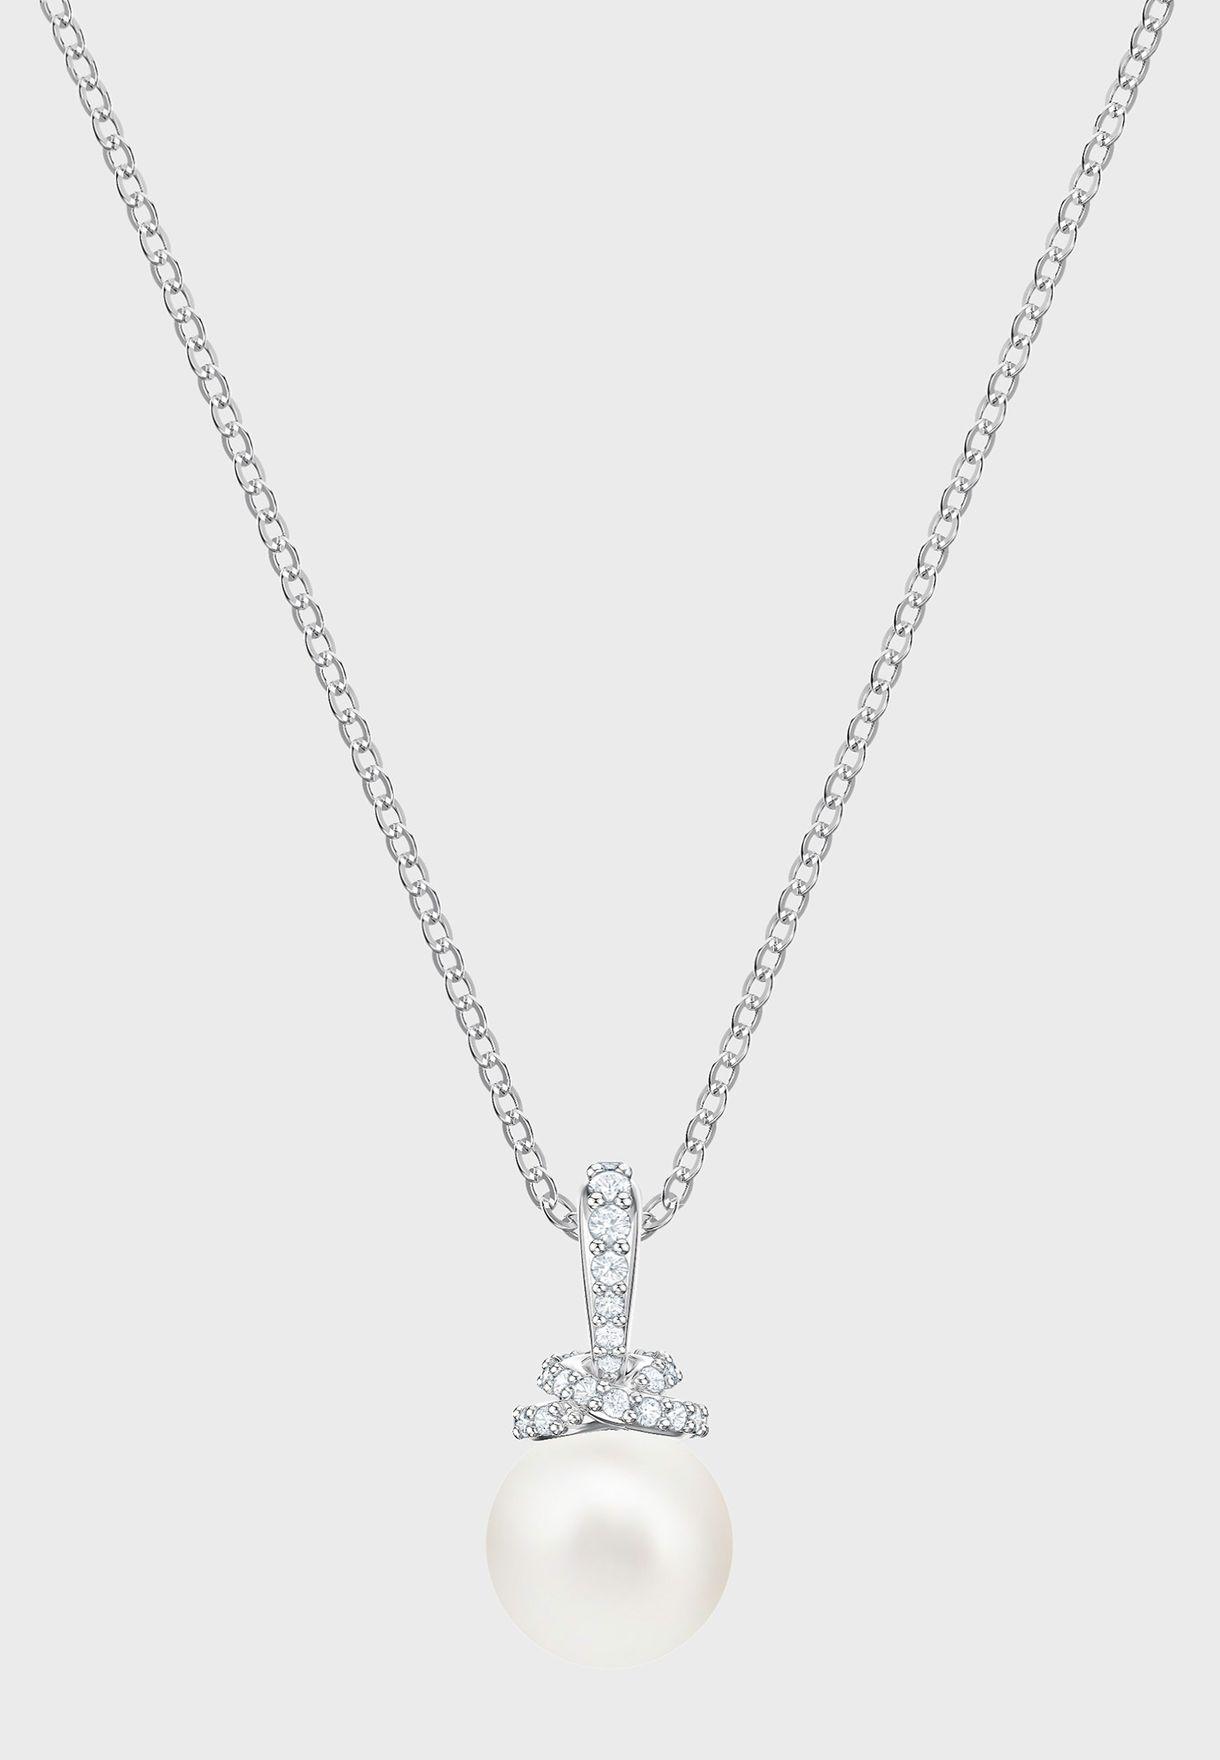 Originally Necklace With Pendant